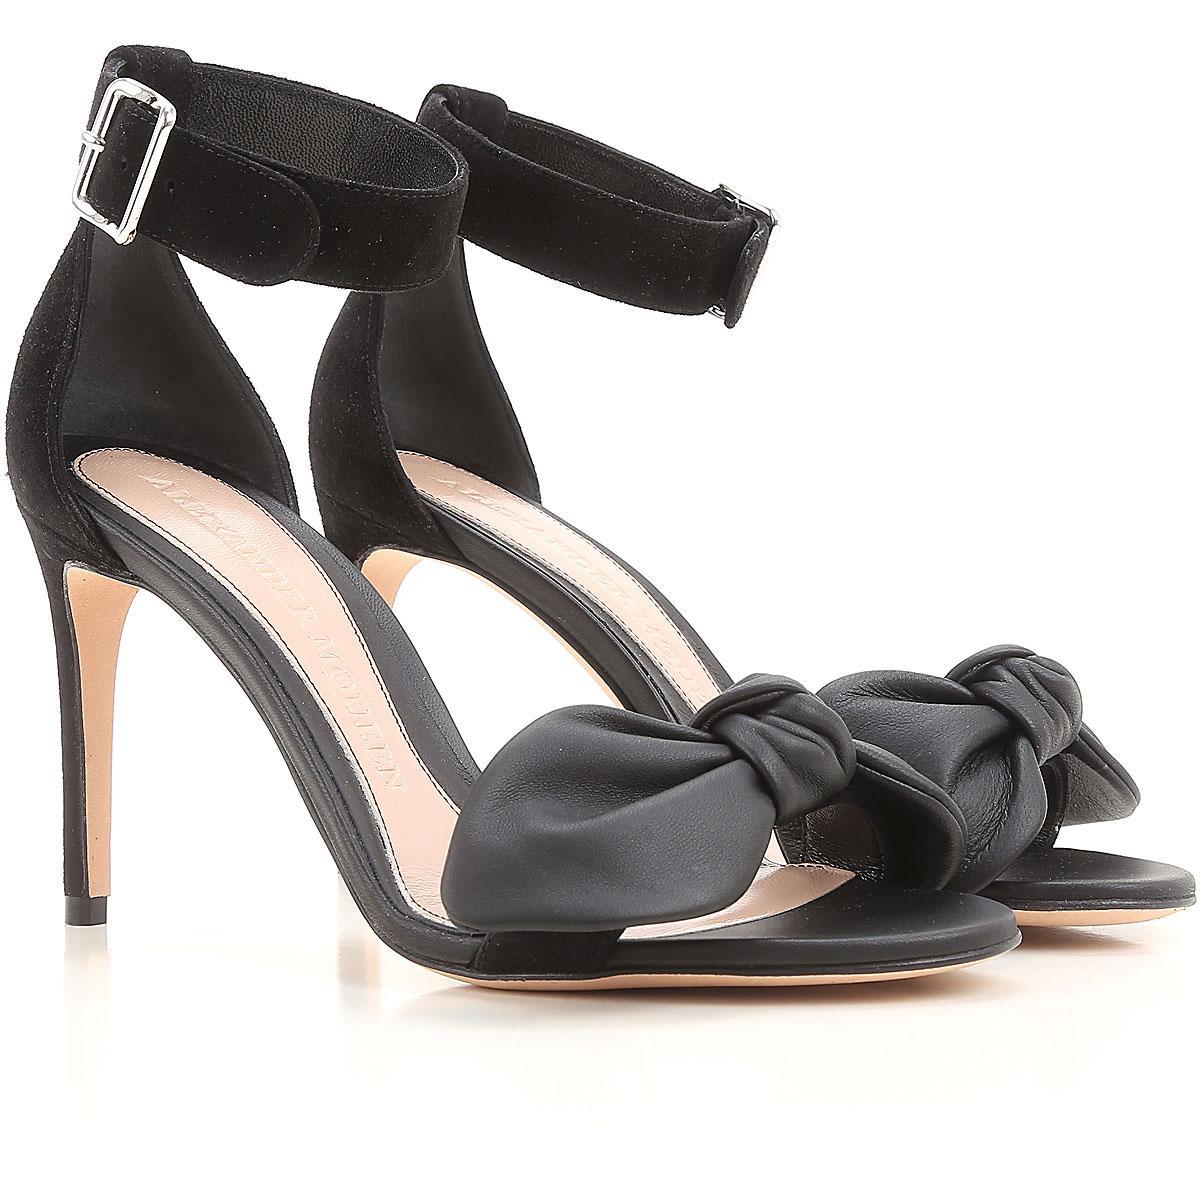 Lyst - Alexander Mcqueen Shoes For Women in Black